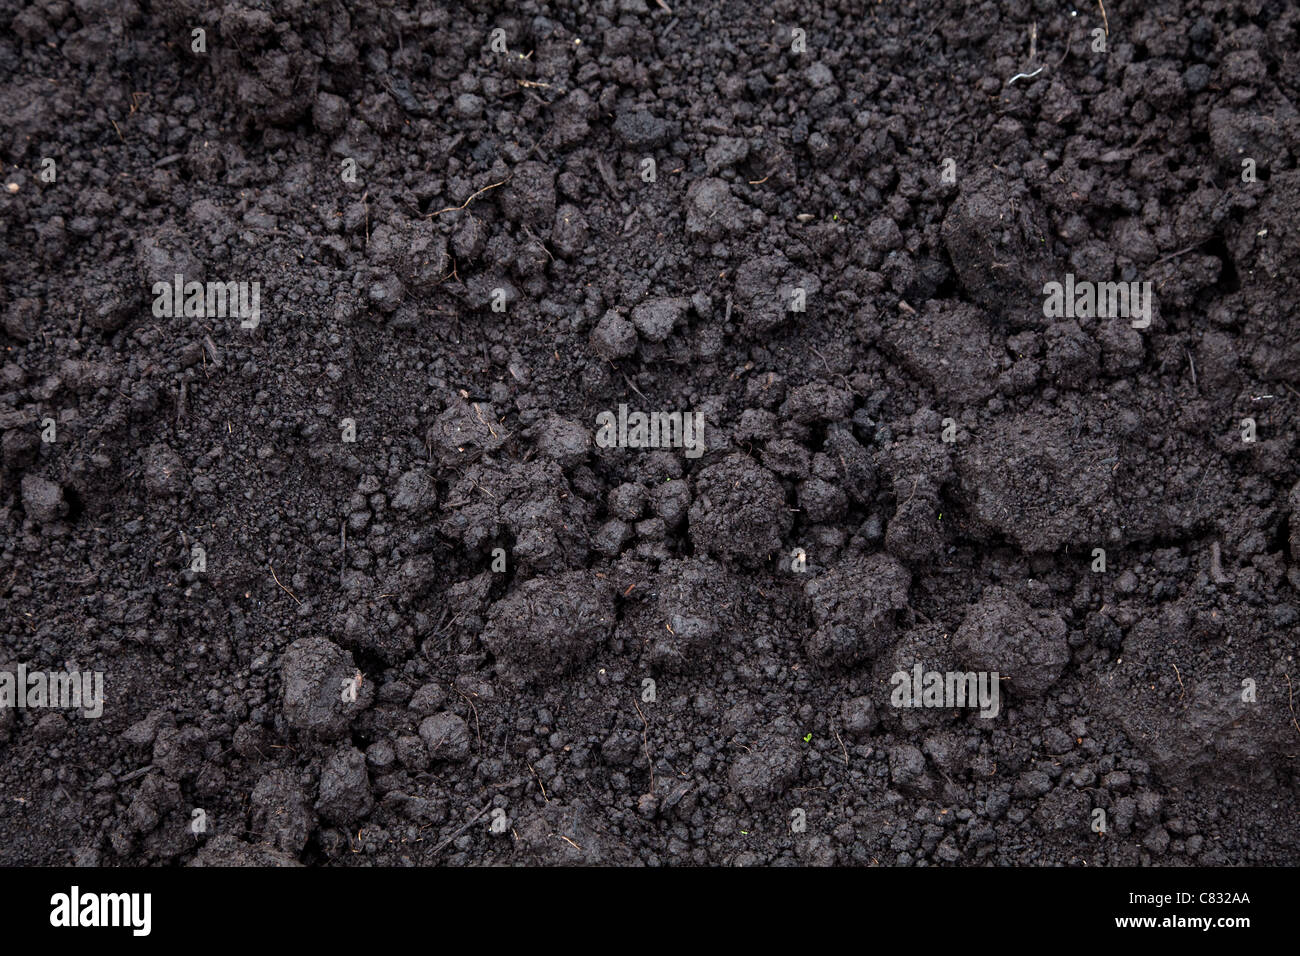 black soil for Textured Background - Stock Image